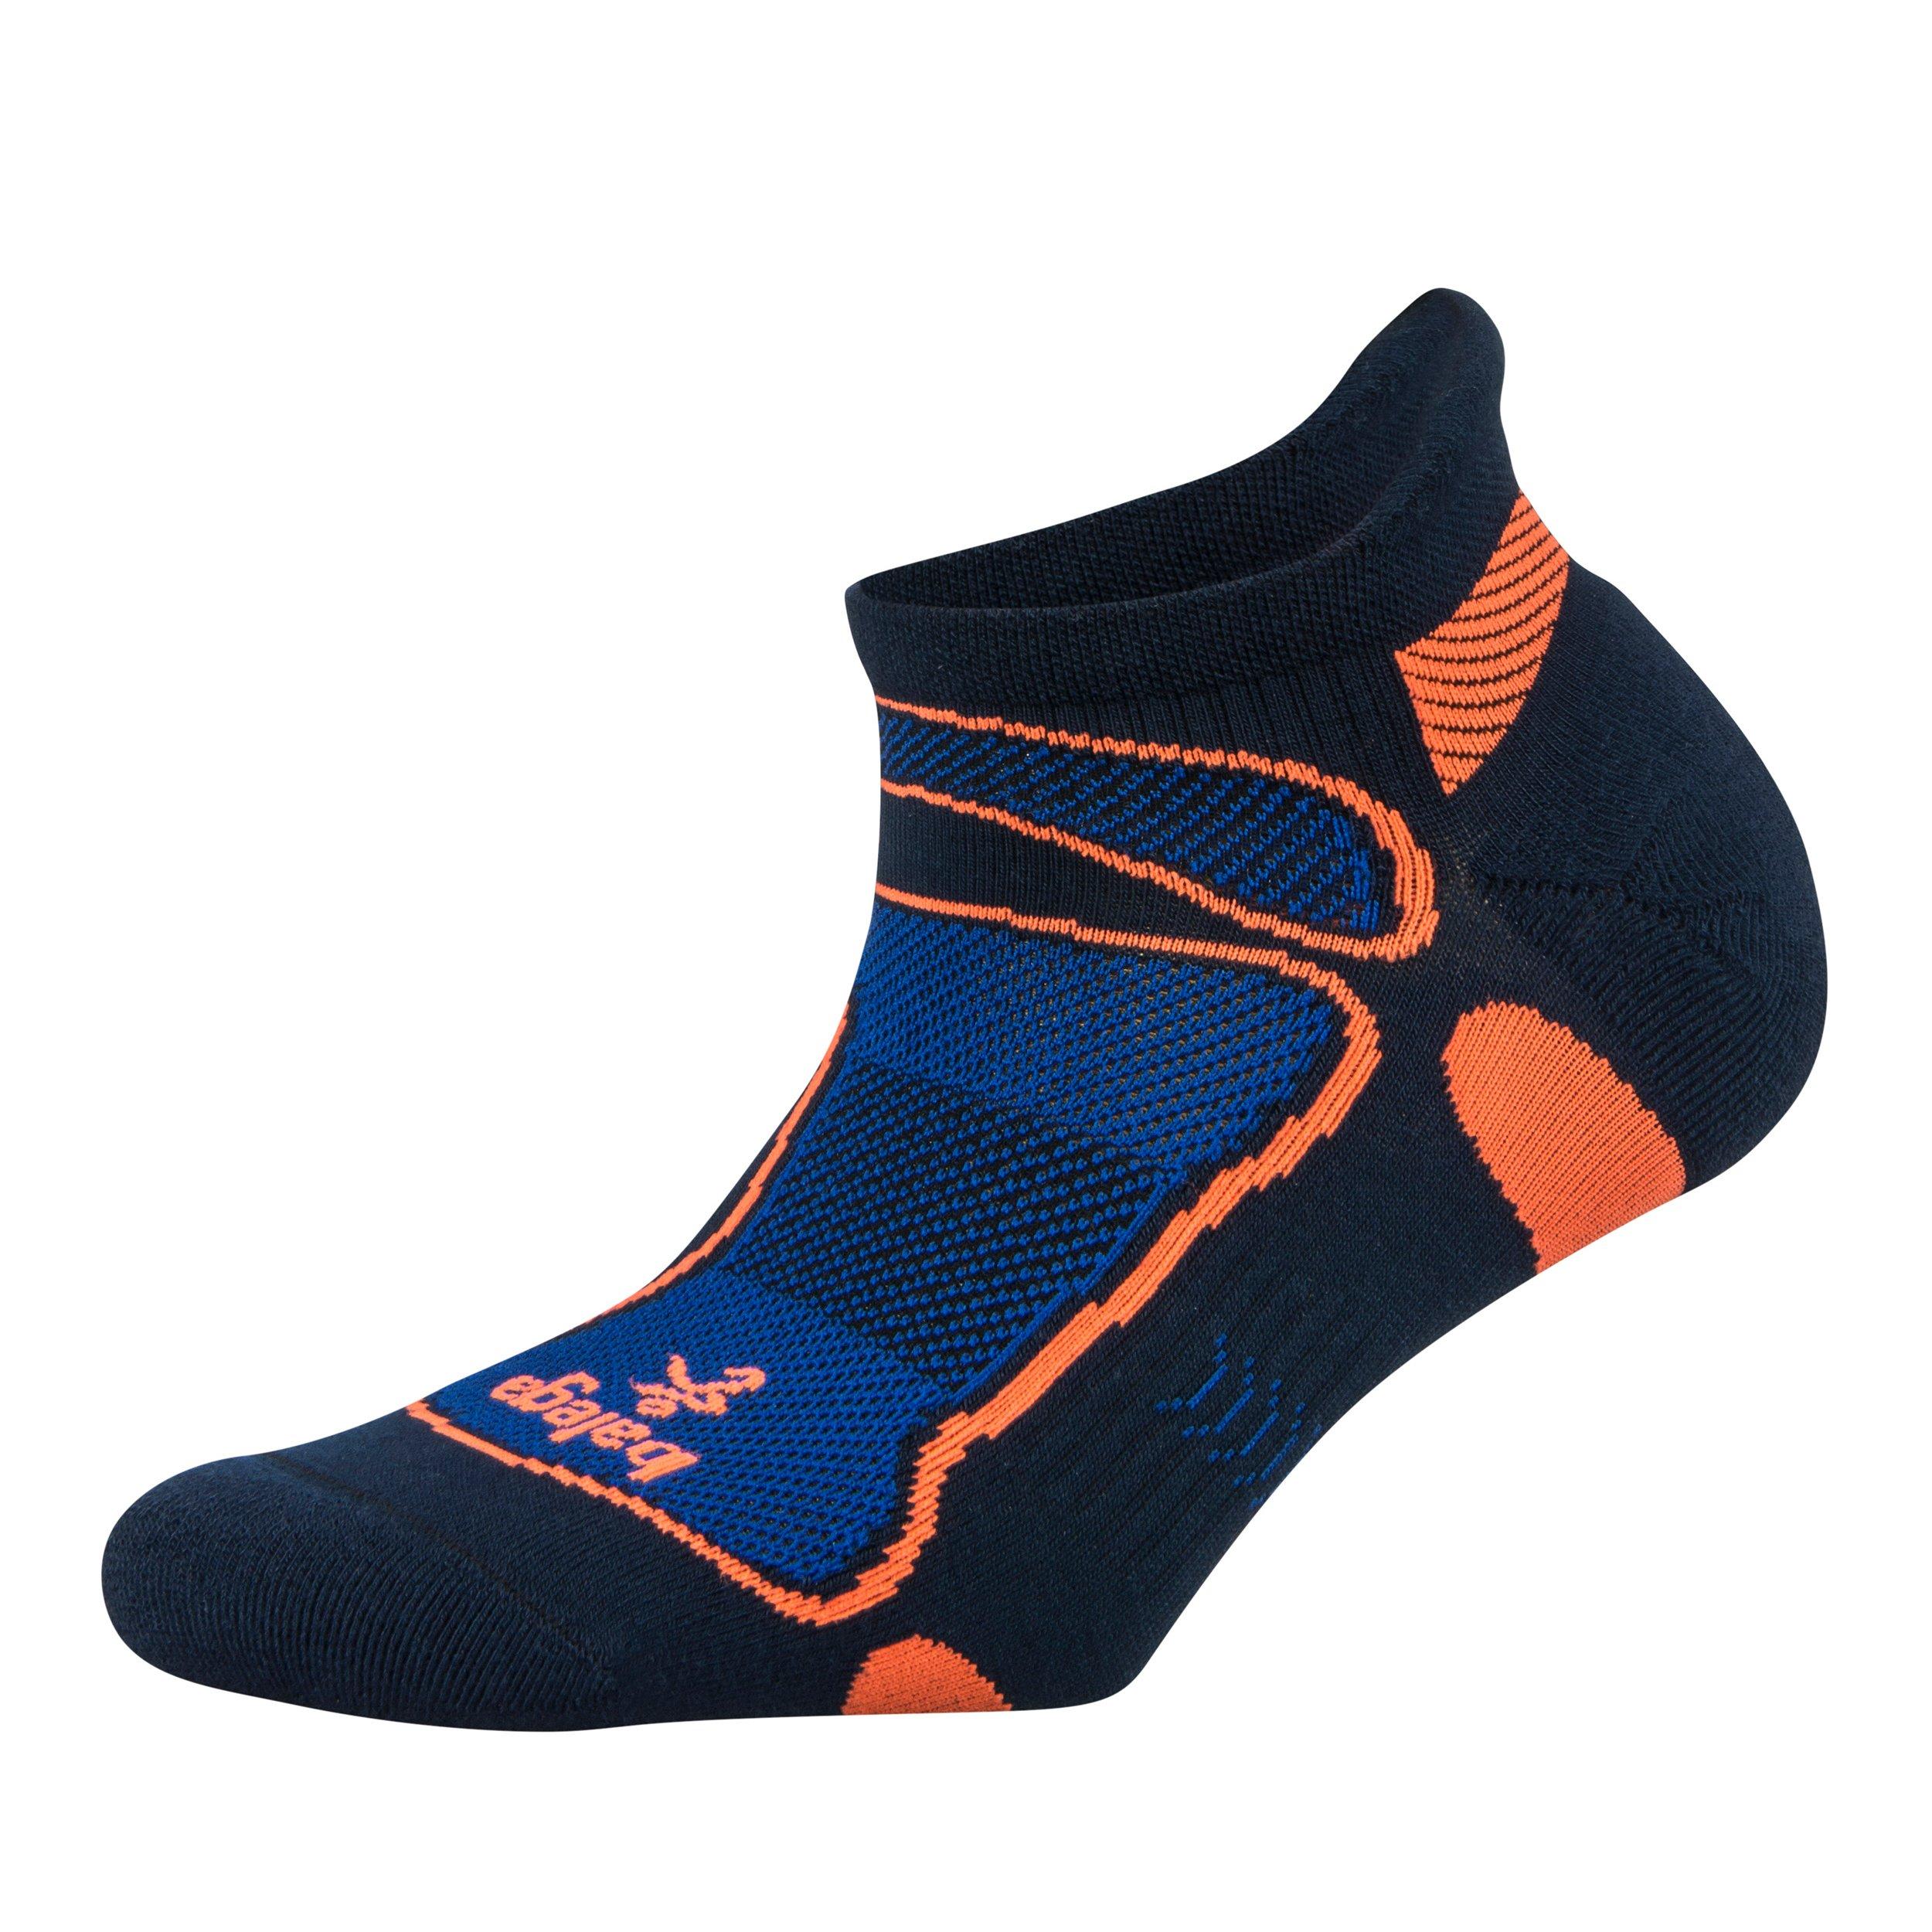 Balega Ultralight No Show Athletic Running Socks for Men and Women (1 Pair), Ink/Cobalt, Large